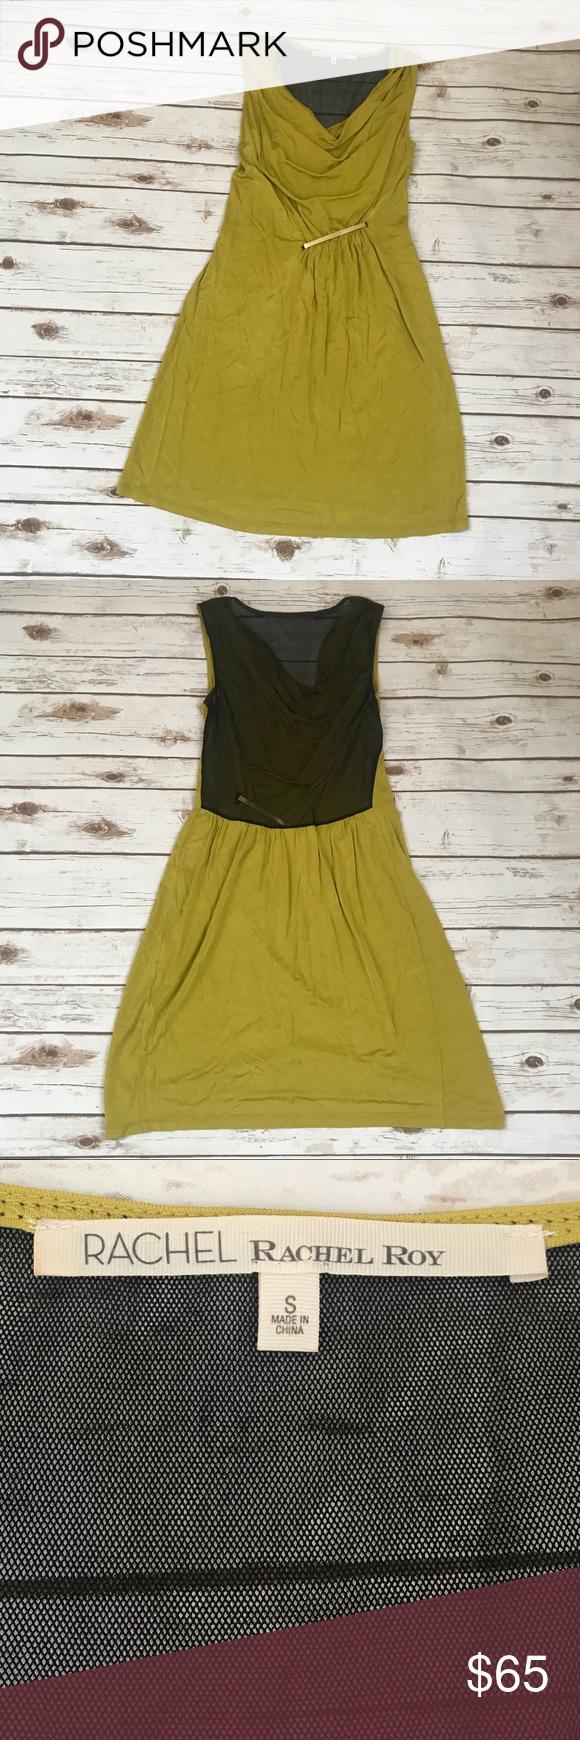 Rachel Rachel Roy Lime Green Dress Gently Used Rachel Rachel Roy Lime Green Dress Gold Decor In The Front Lime Green Dress Clothes Design Rachel Roy Dresses [ 1740 x 580 Pixel ]